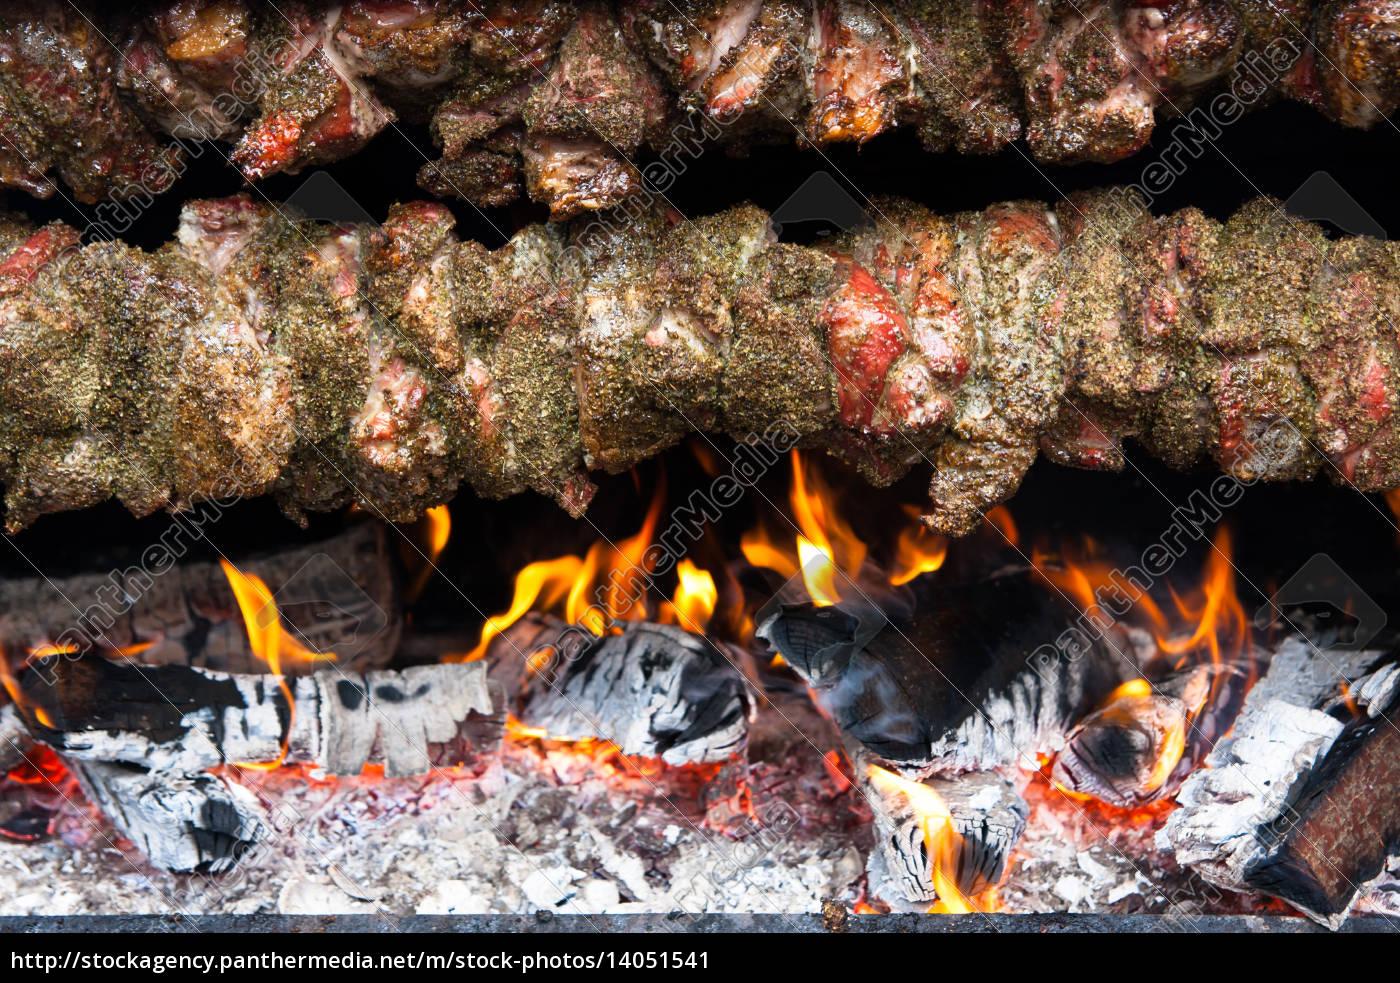 meat, skewer, over, an, open, fire - 14051541